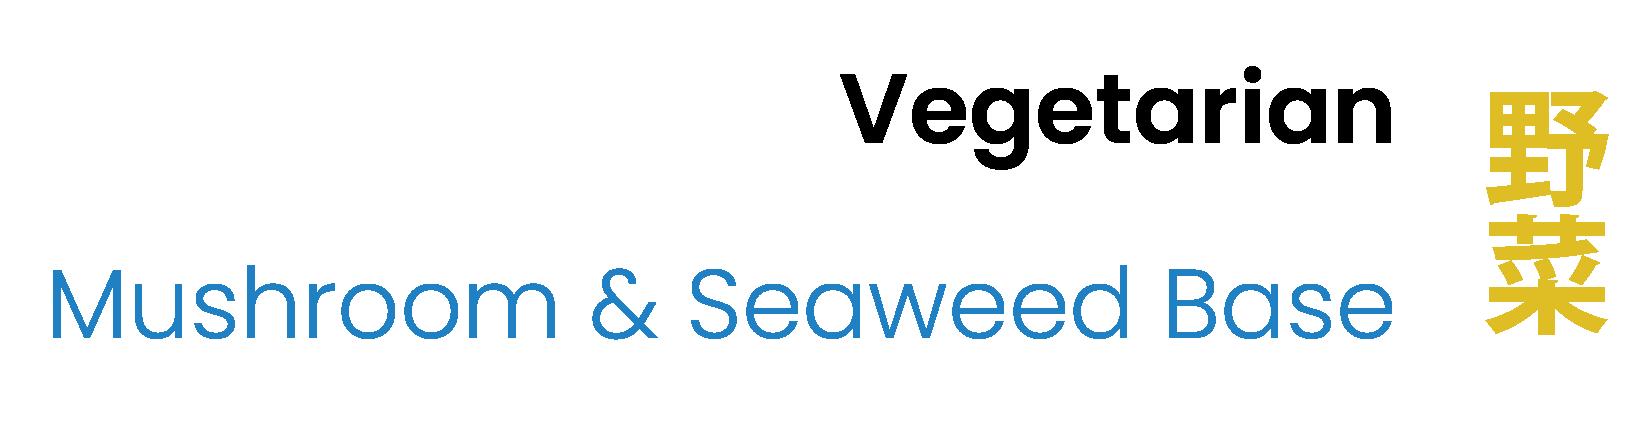 Vegetarian Mushroom & Seaweed Base